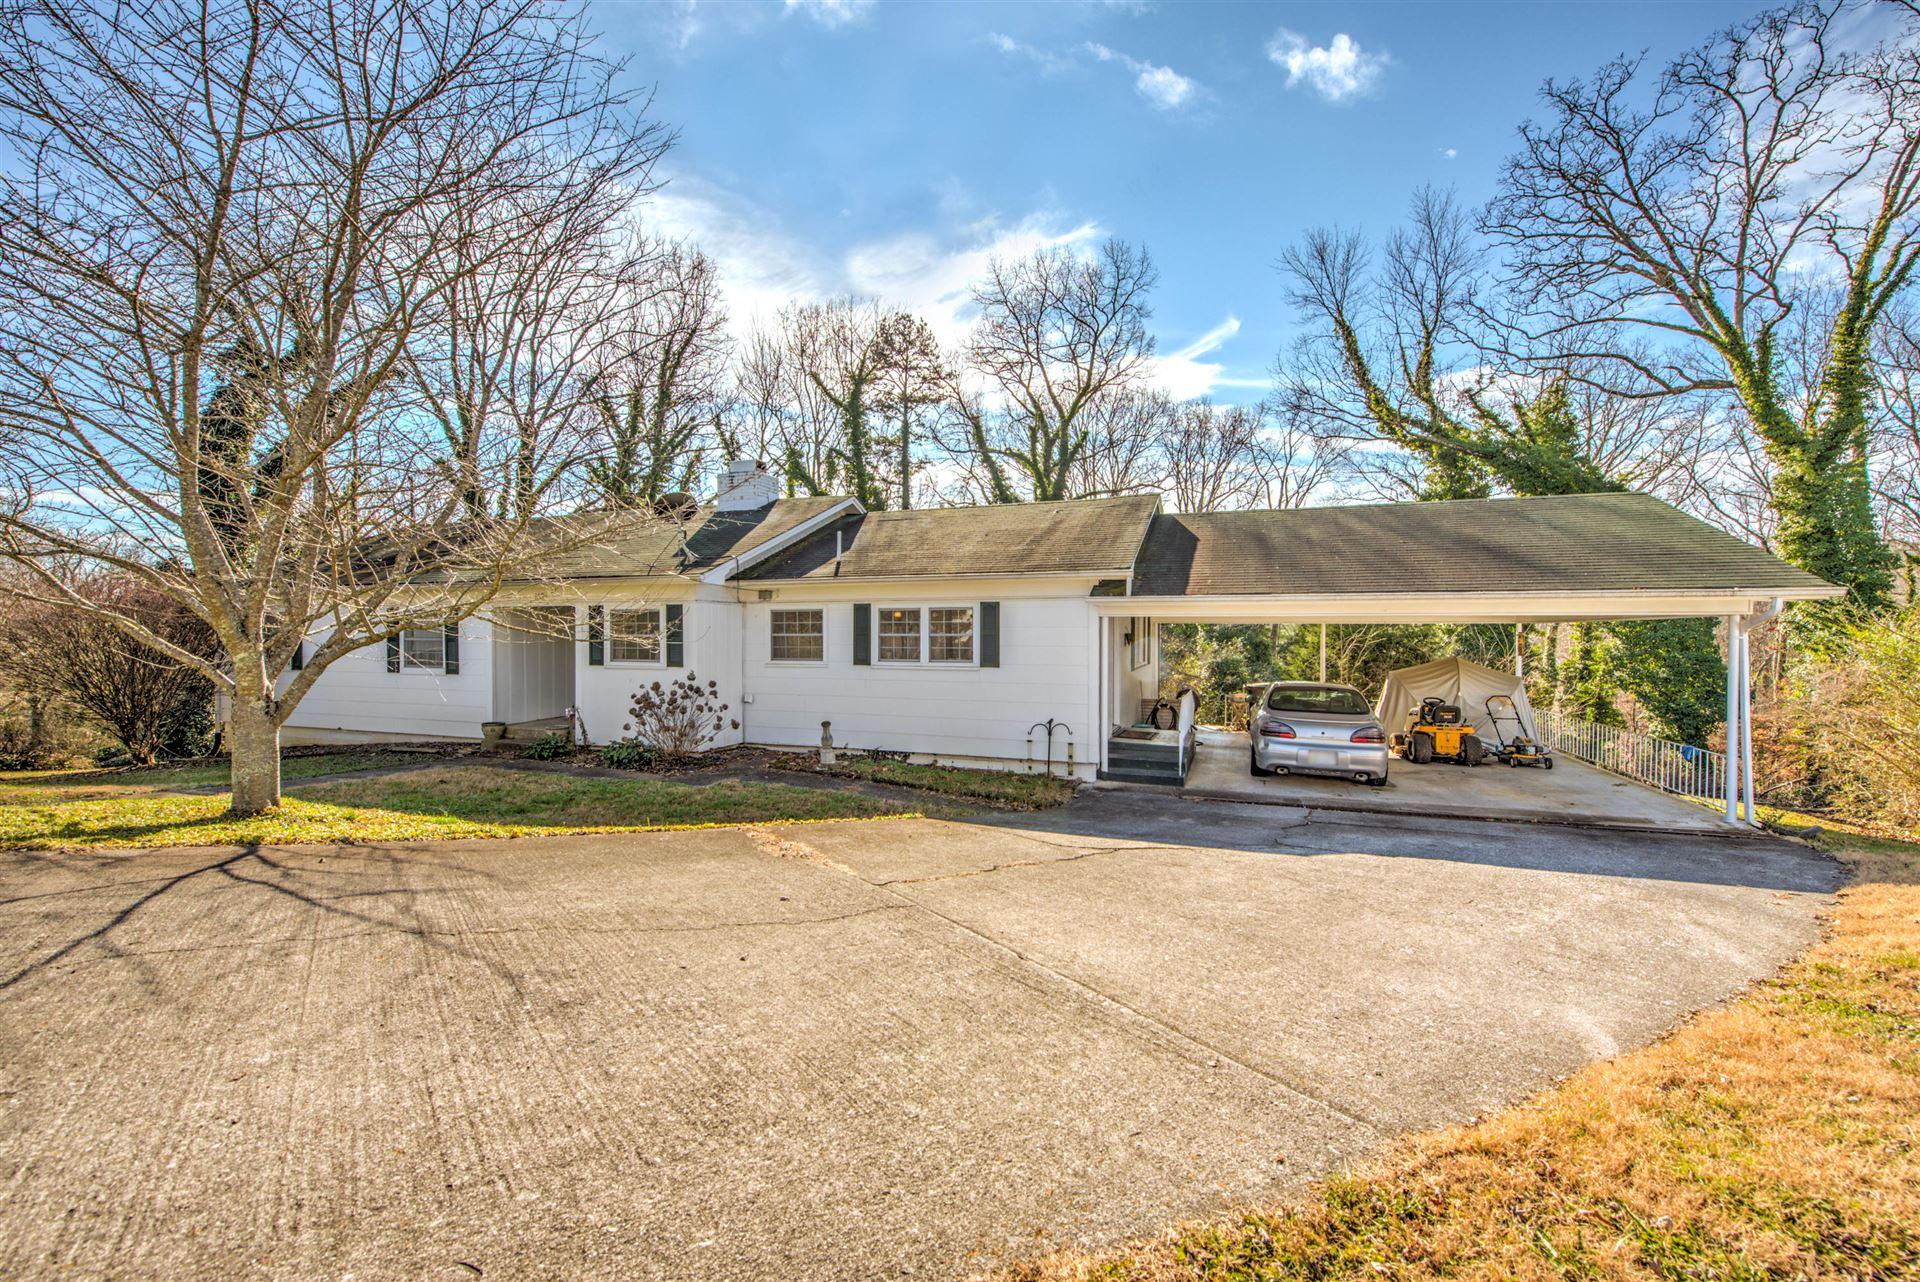 Photo of 109 Norris Lane, Oak Ridge, TN 37830 (MLS # 1139069)